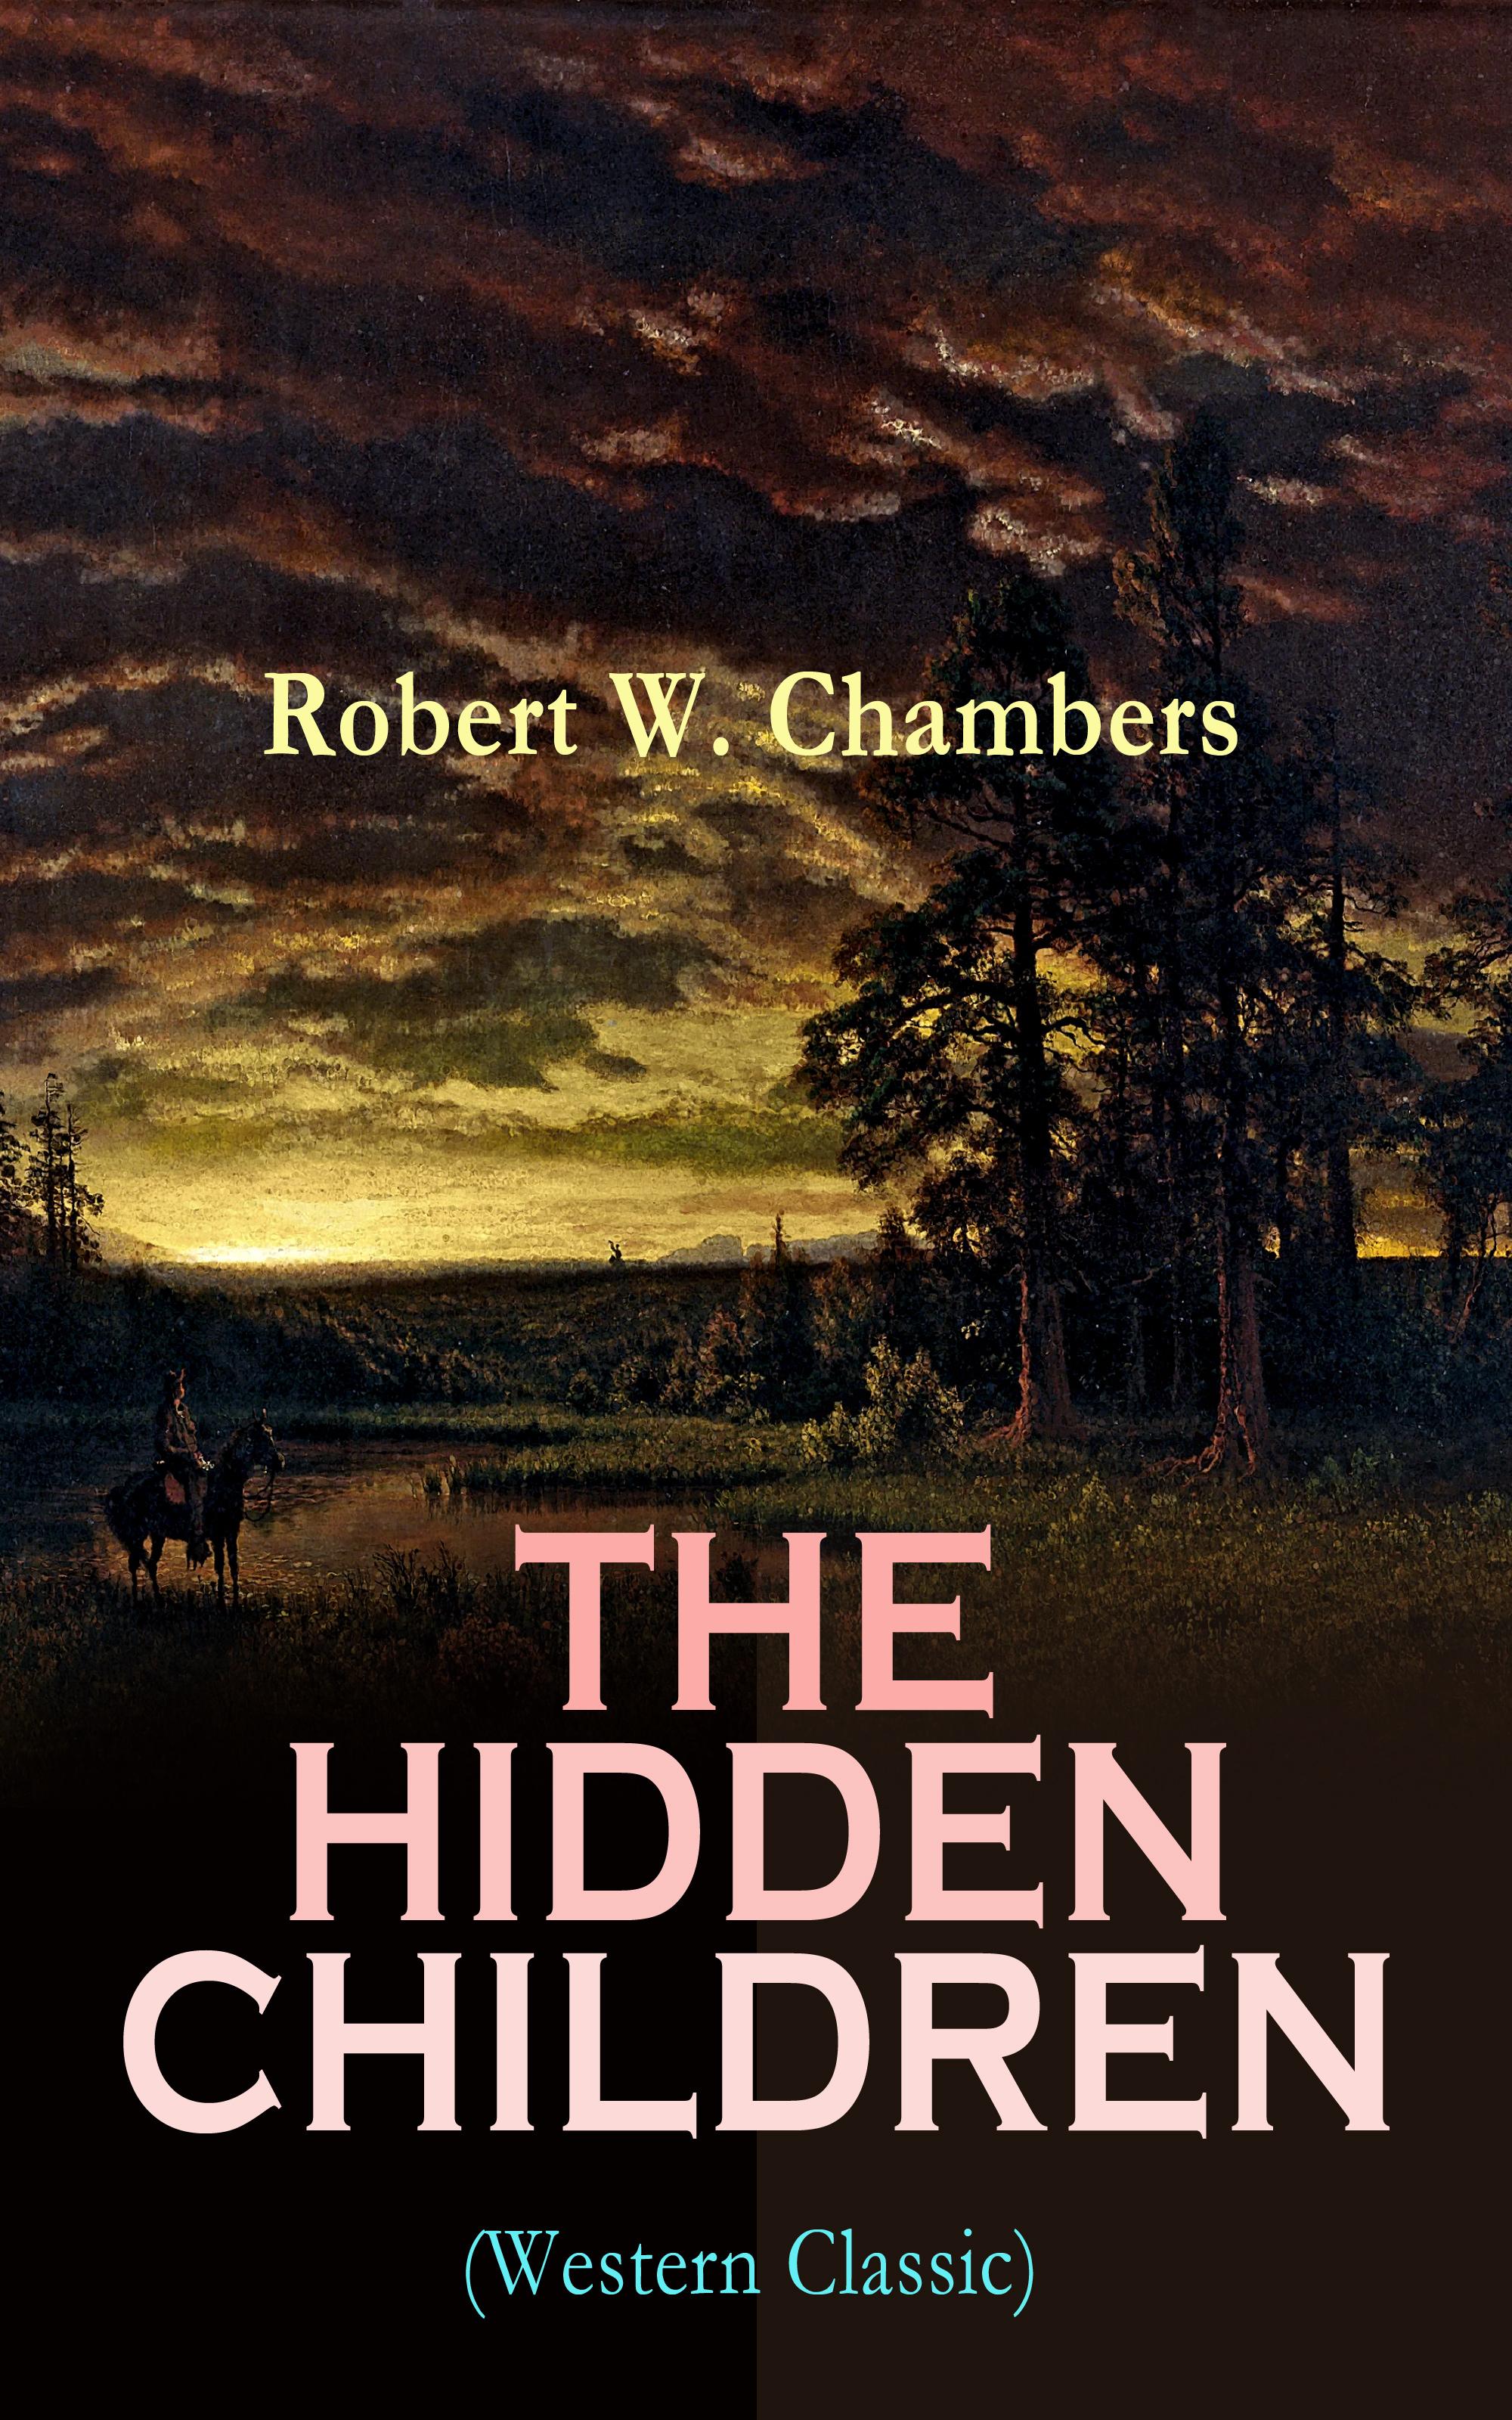 Robert W. Chambers THE HIDDEN CHILDREN (Western Classic) robert w chambers with the band